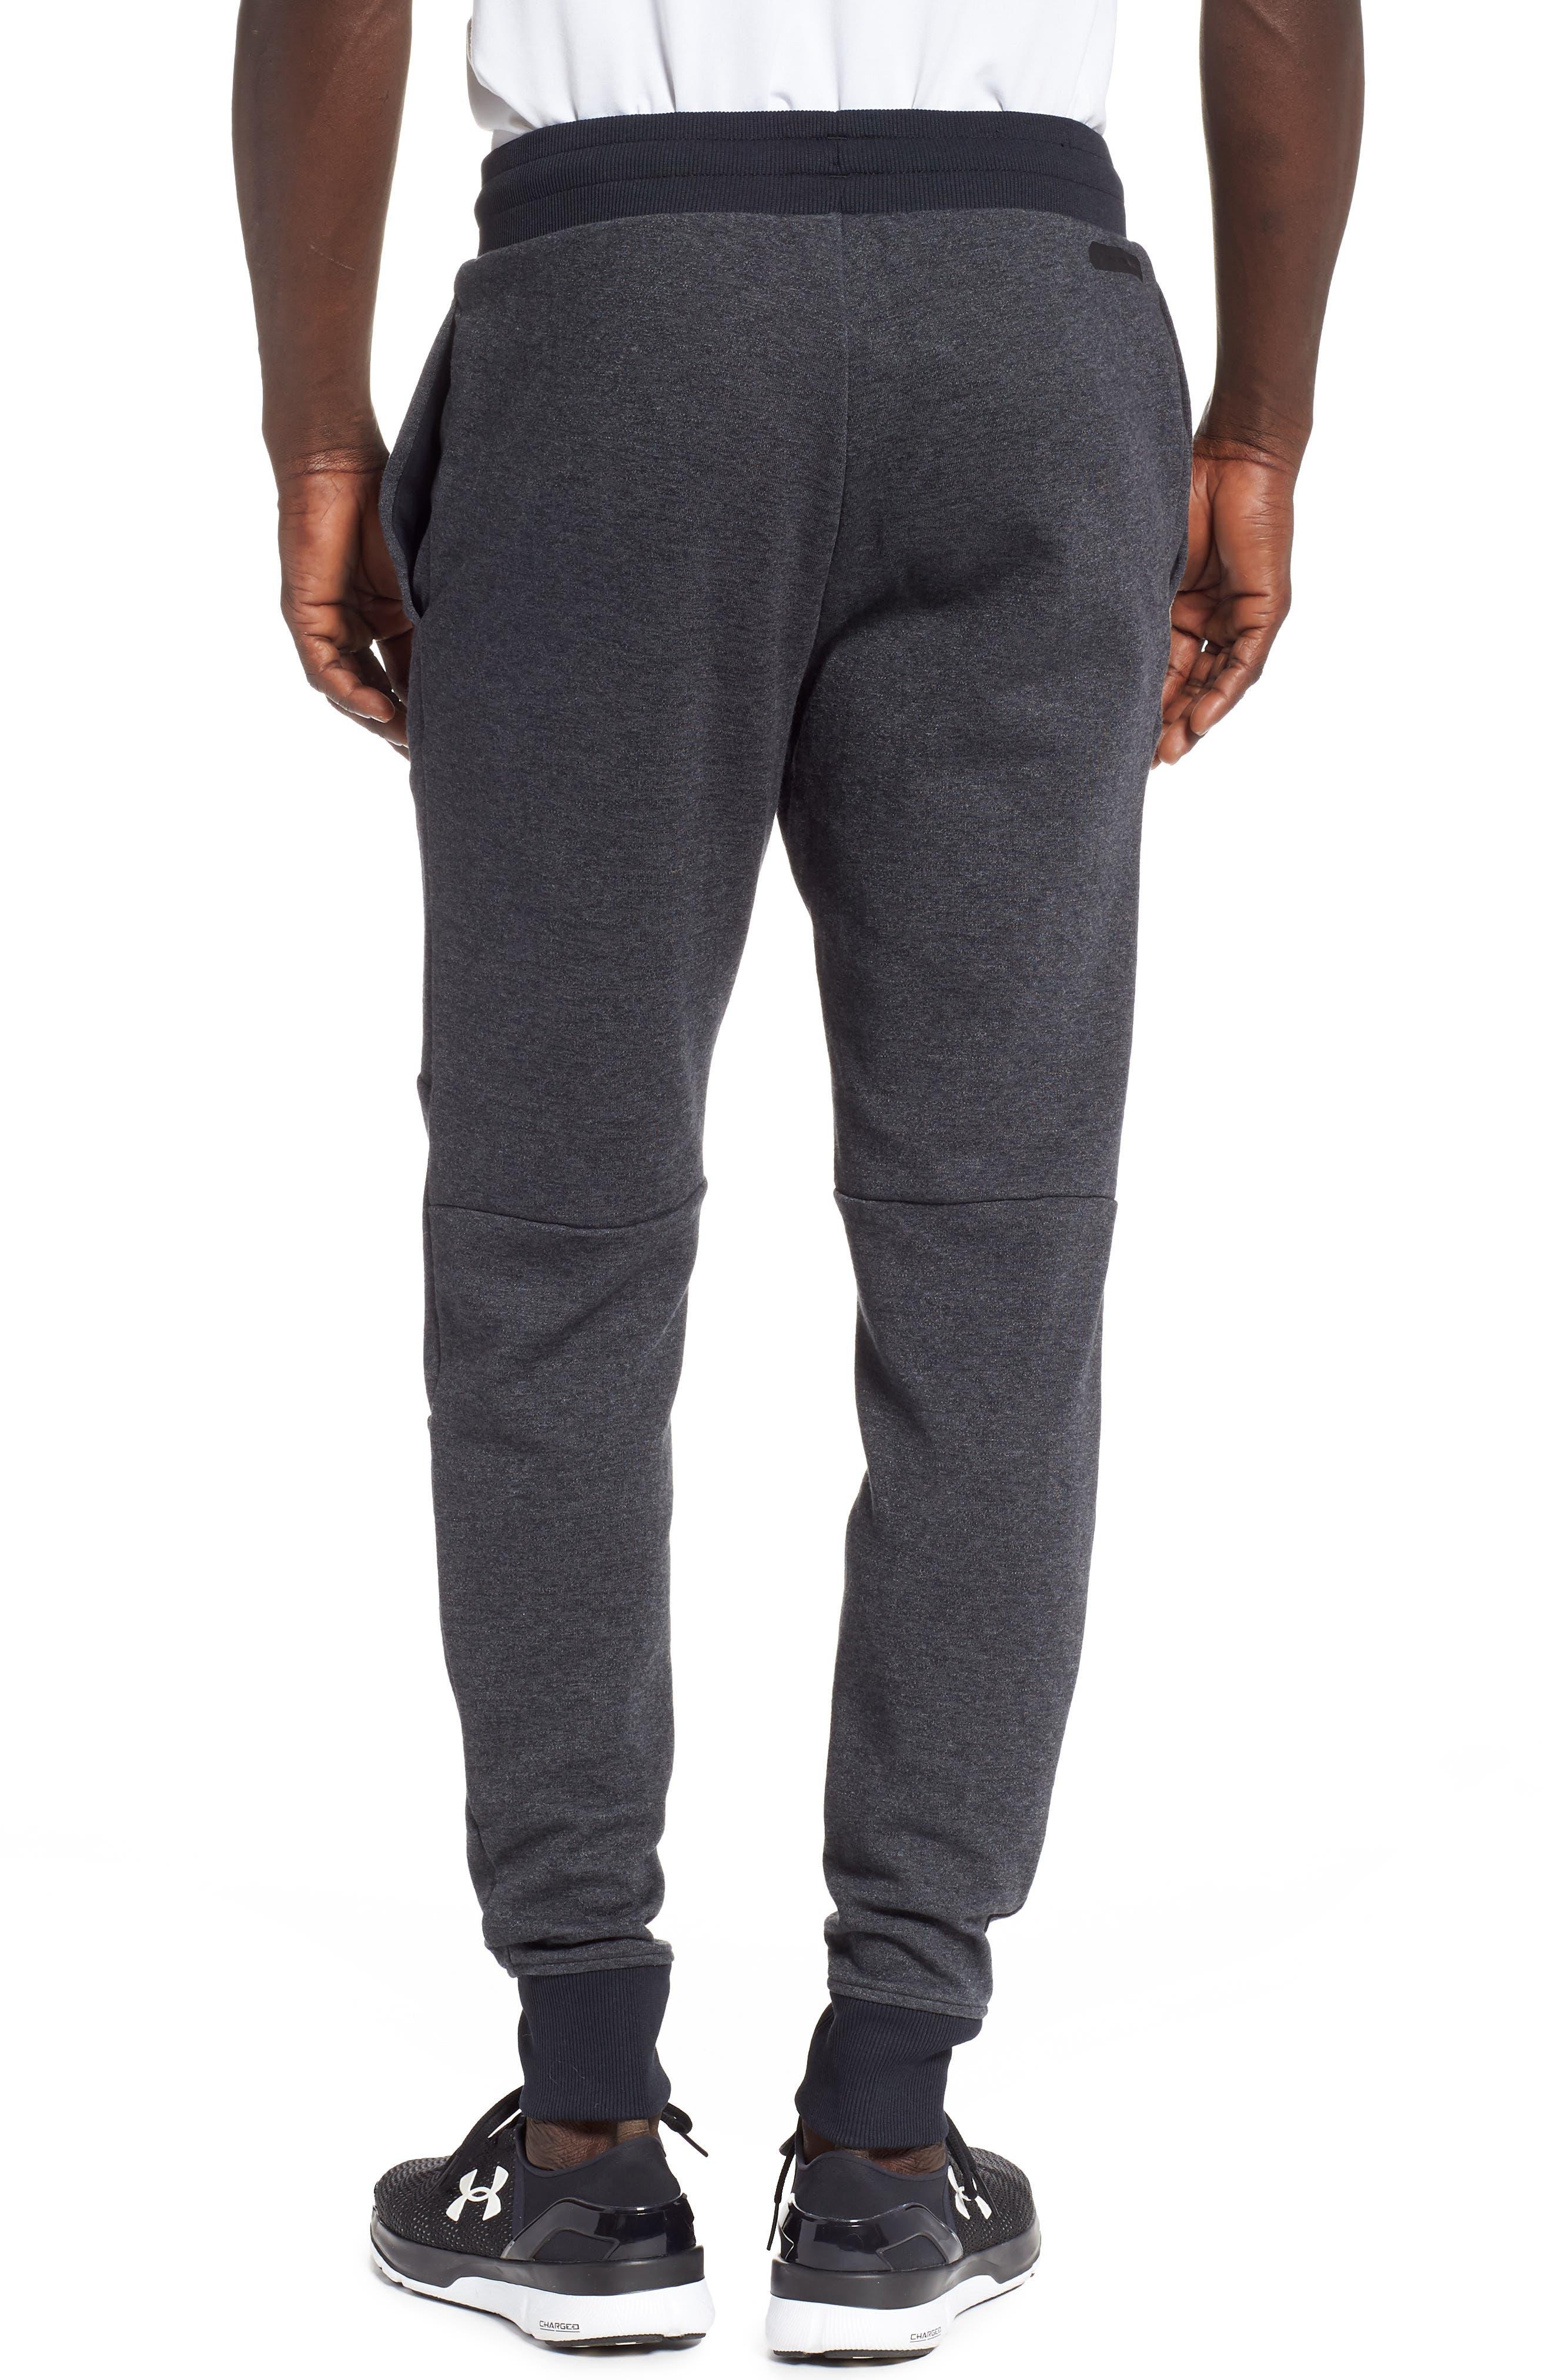 UNDER ARMOUR,                             Unstoppable Double Knit Jogger Pants,                             Alternate thumbnail 2, color,                             001